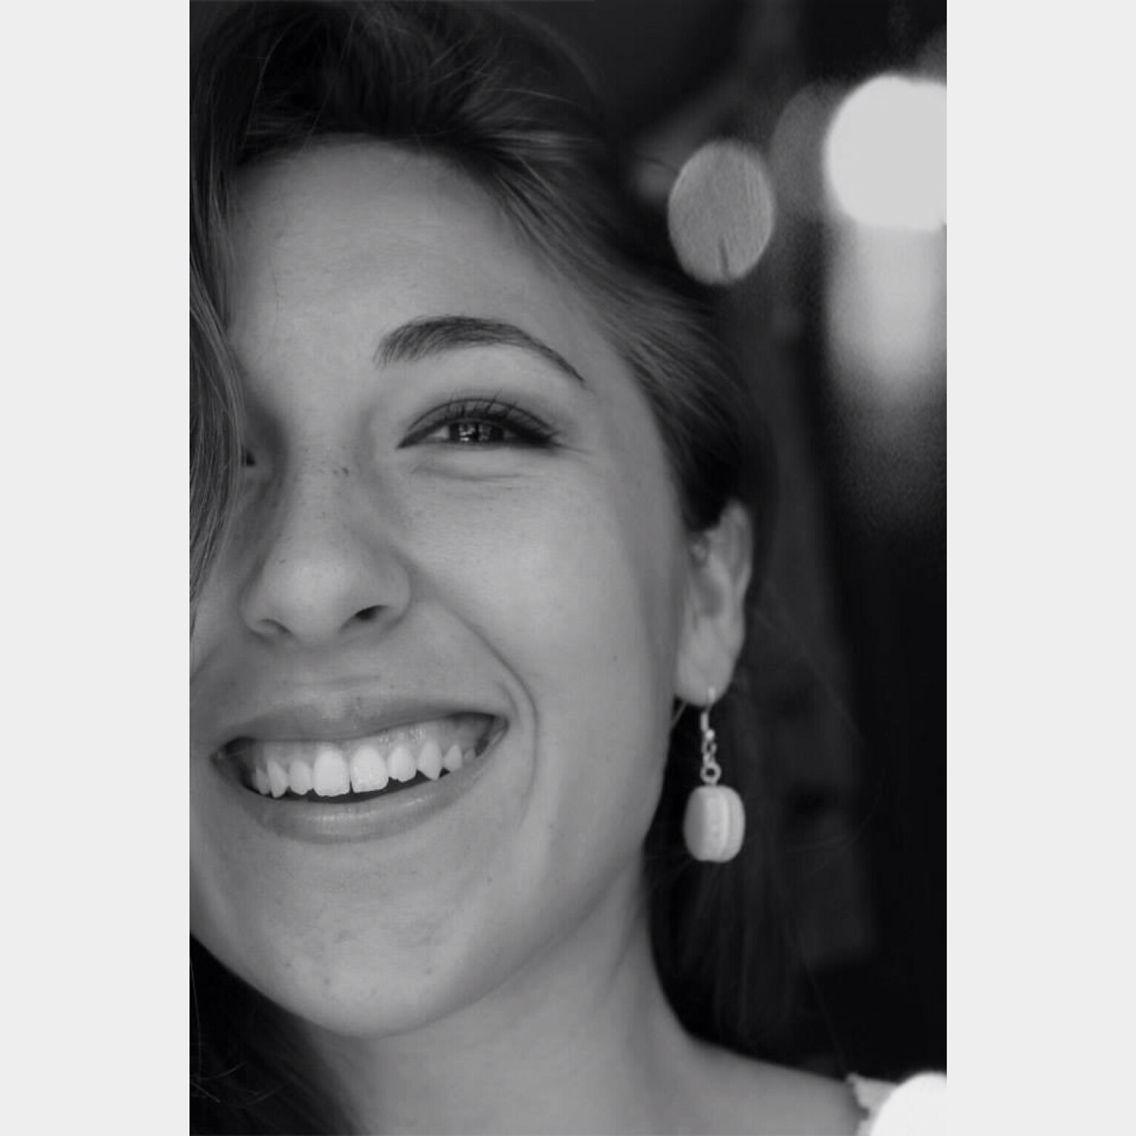 Smile ▪️▫️